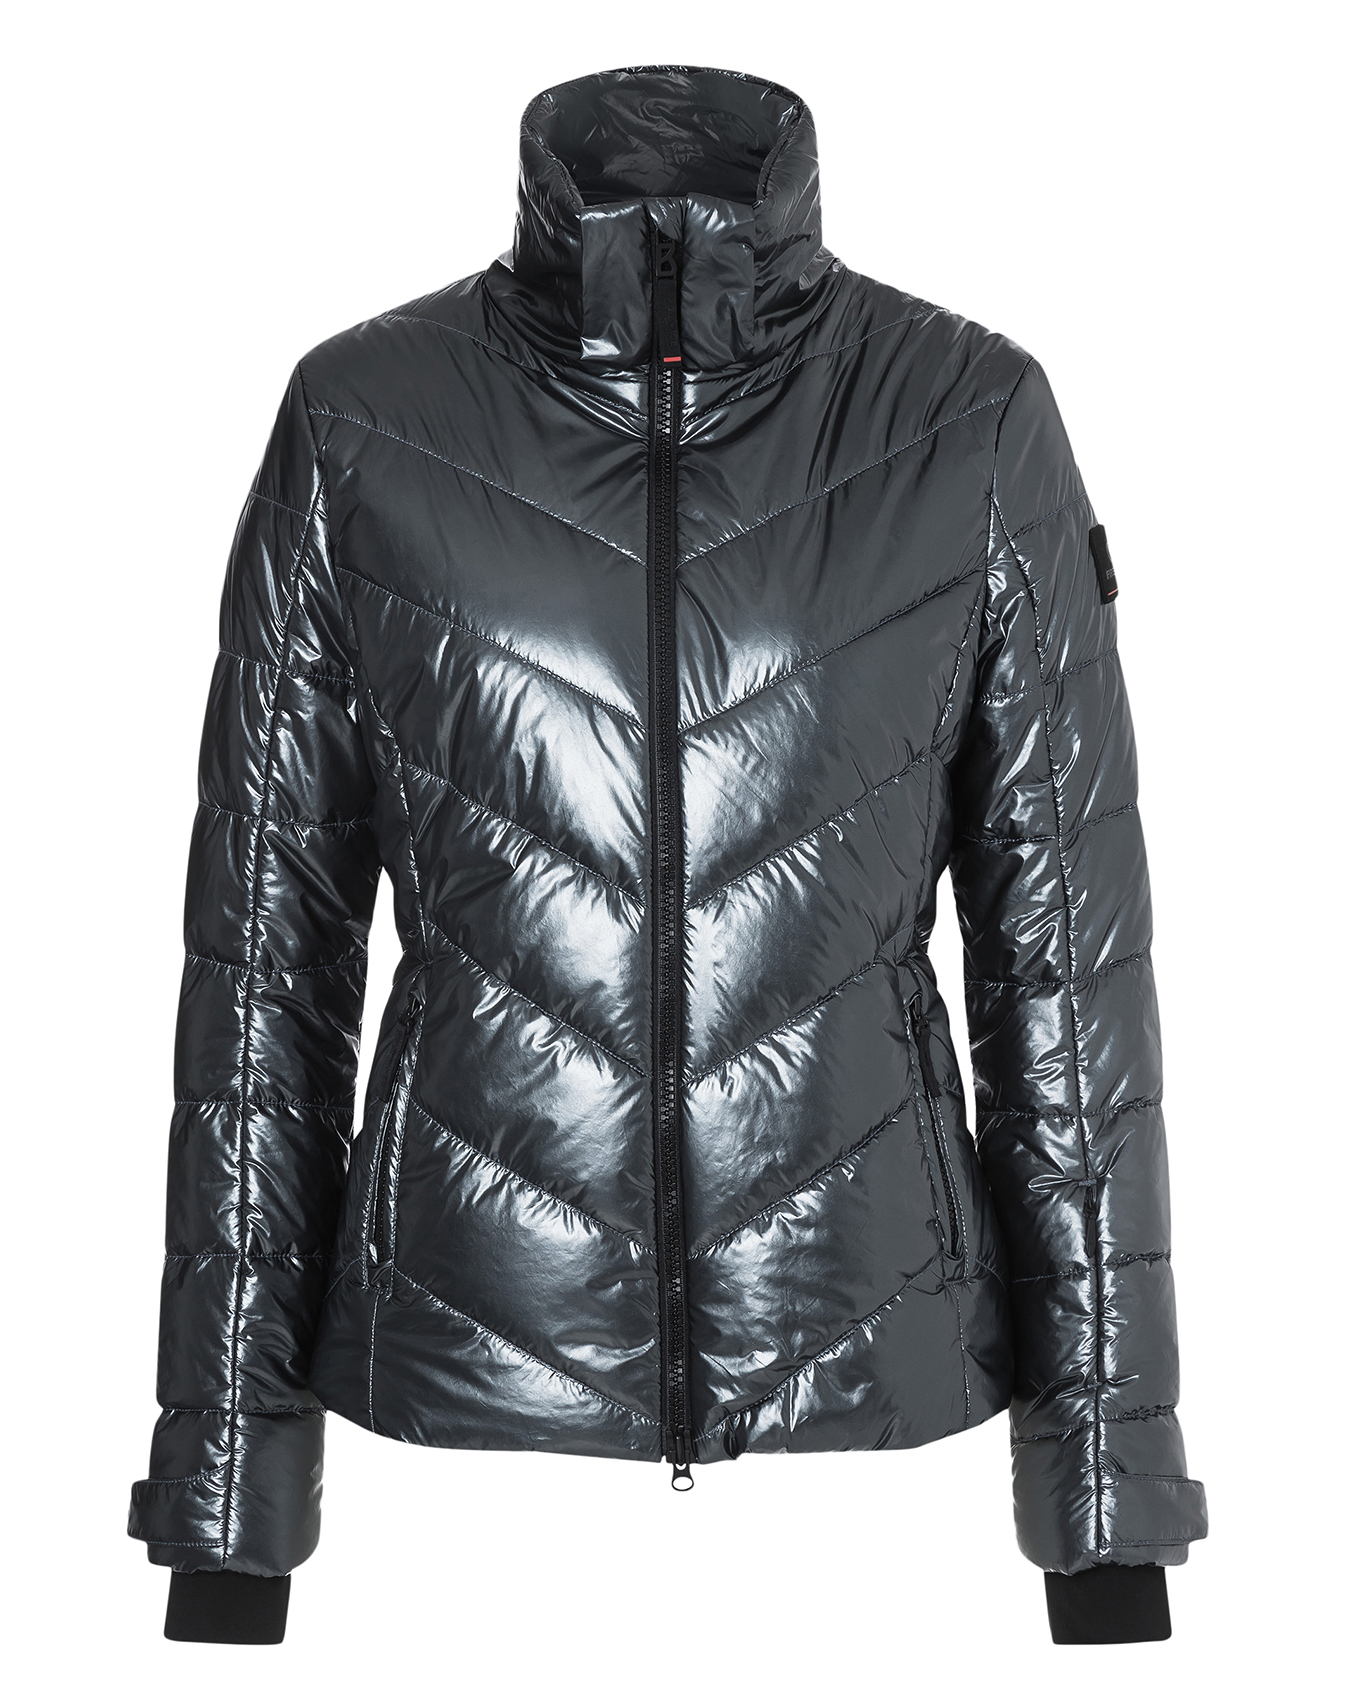 newest collection various design exquisite design Ski-Jacket SASSY2 015